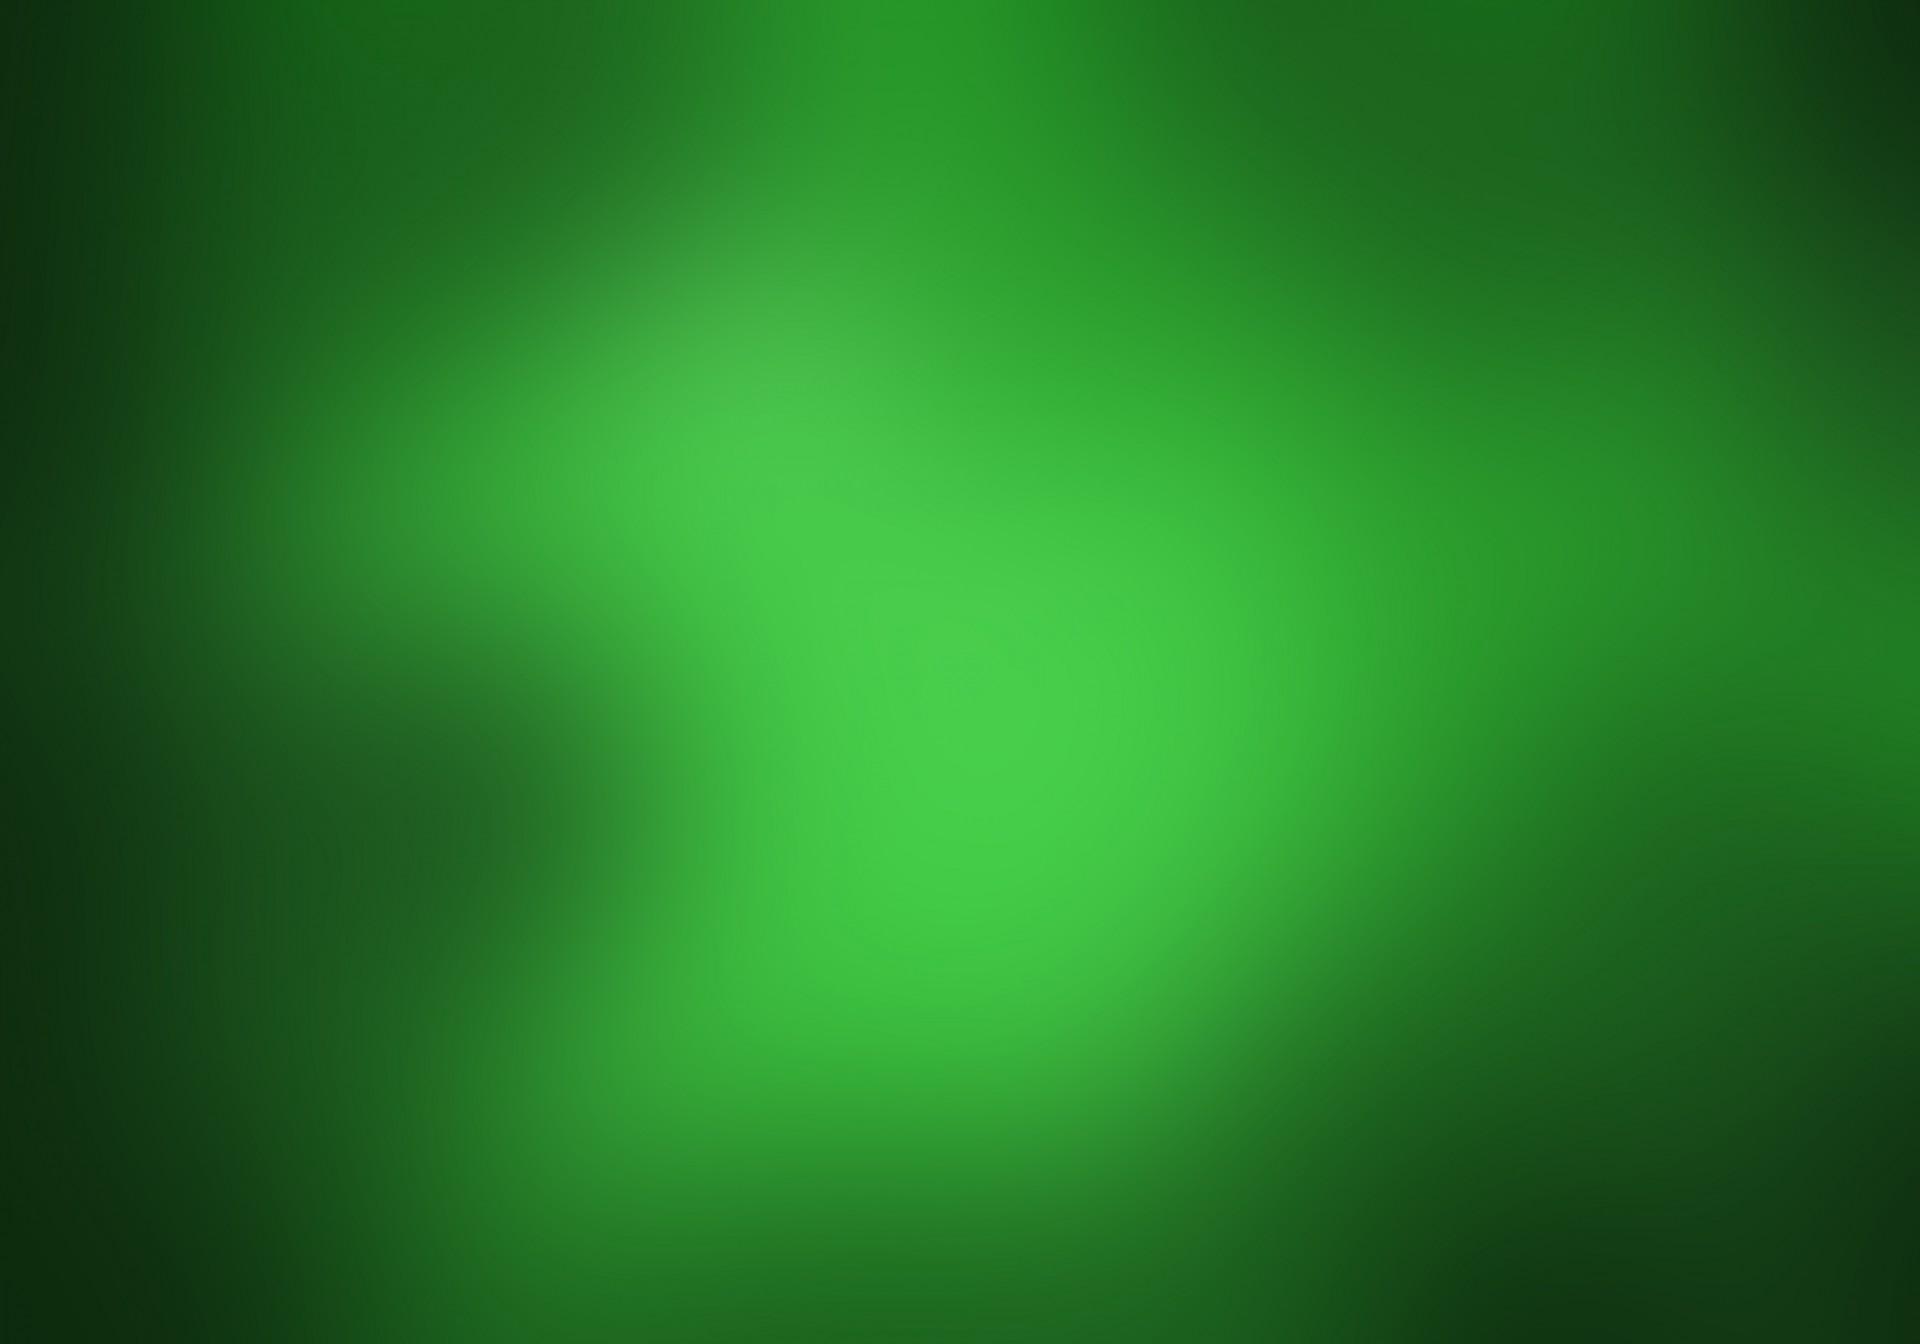 Green Background Blur Free Stock Photo.